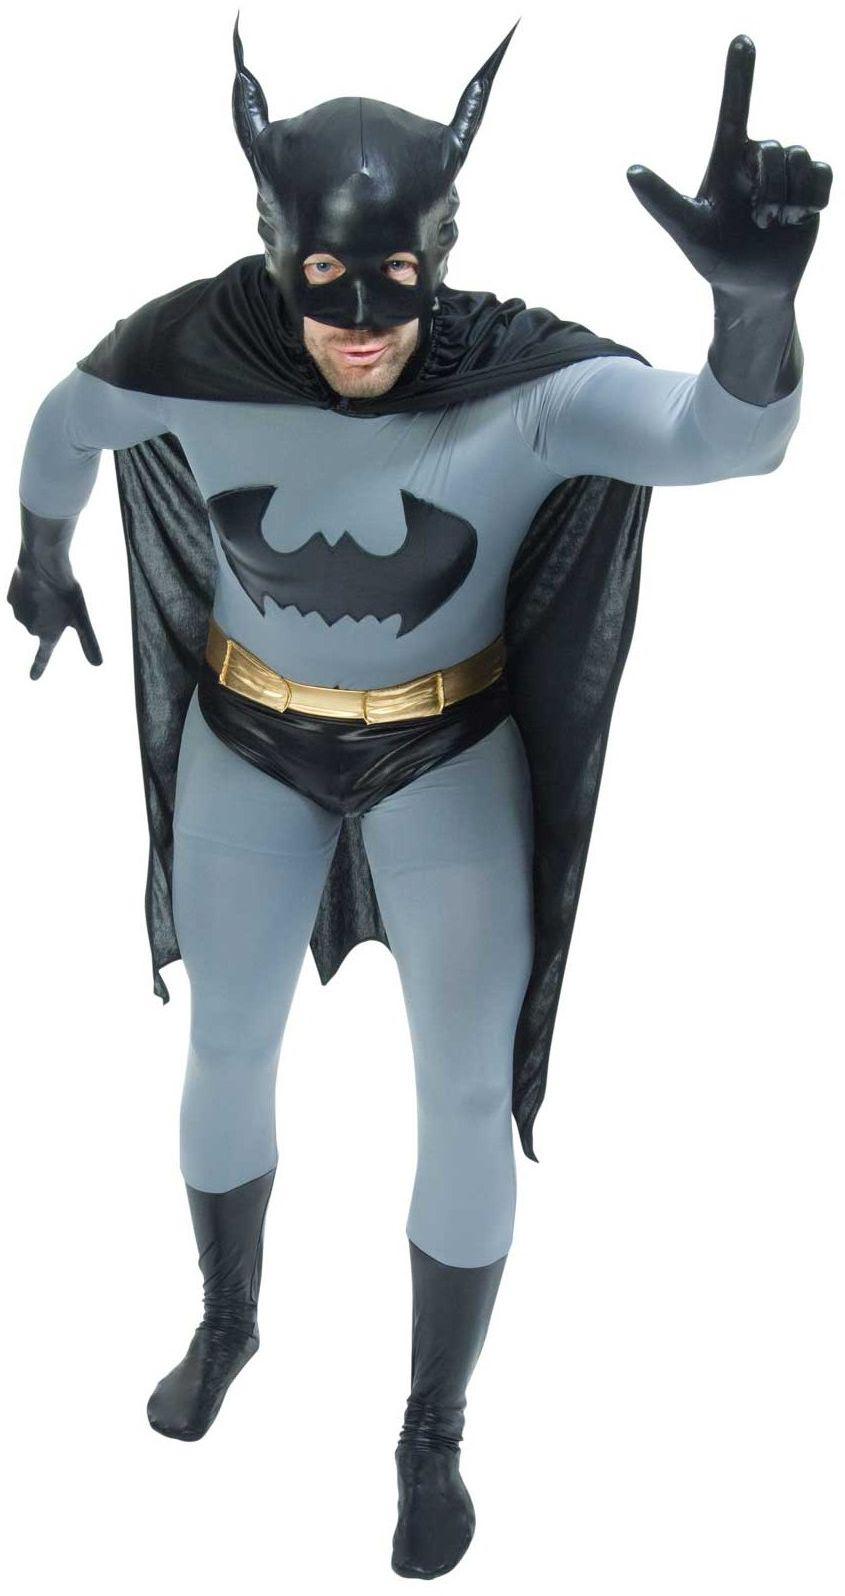 Zoelibat 97216545.006.L - Speedsuit Batman The Dark Knight - Unisex kombinezon całego ciała Bodysuit Catsuit, wielokolorowy